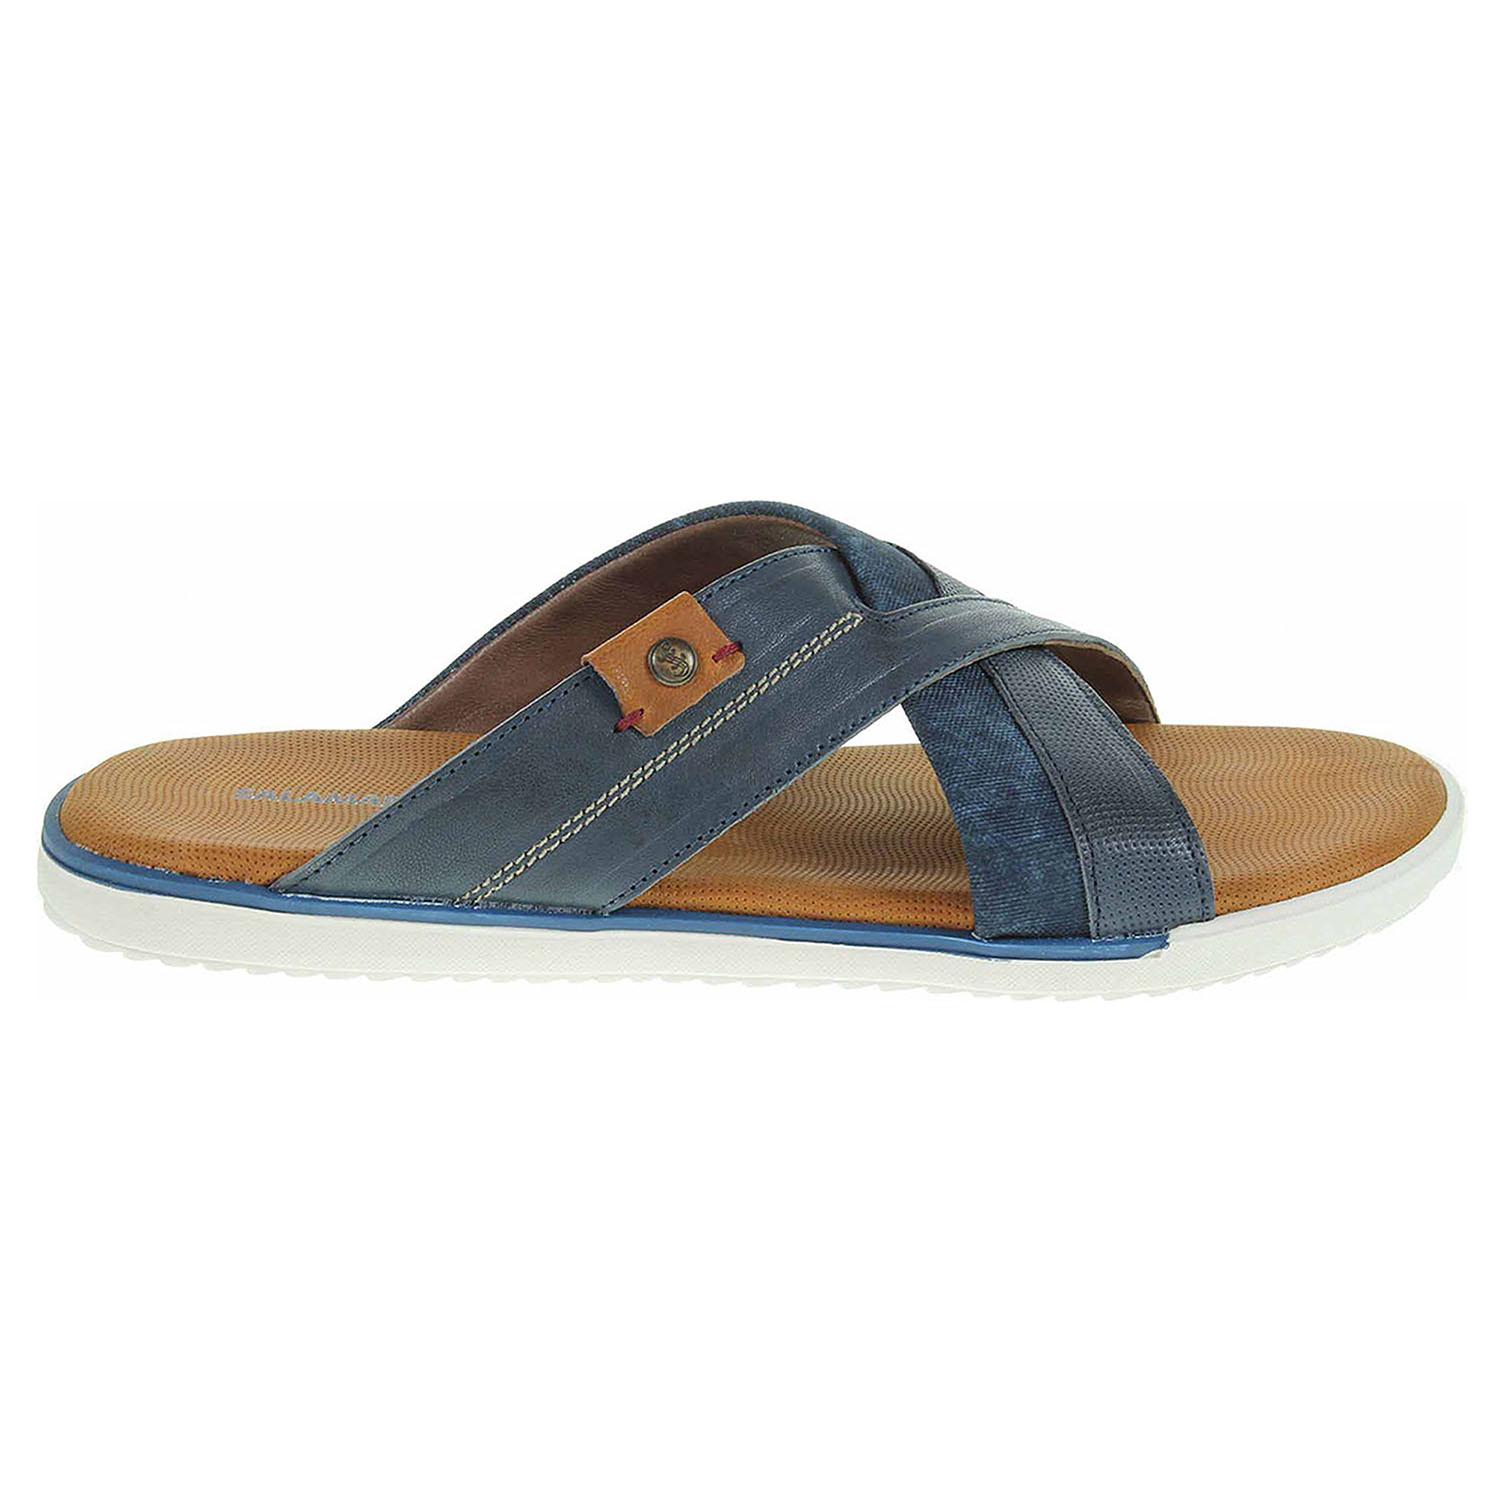 d950756e99f0 Ecco Salamander pánské pantofle 31-75005-42 navy 24900167